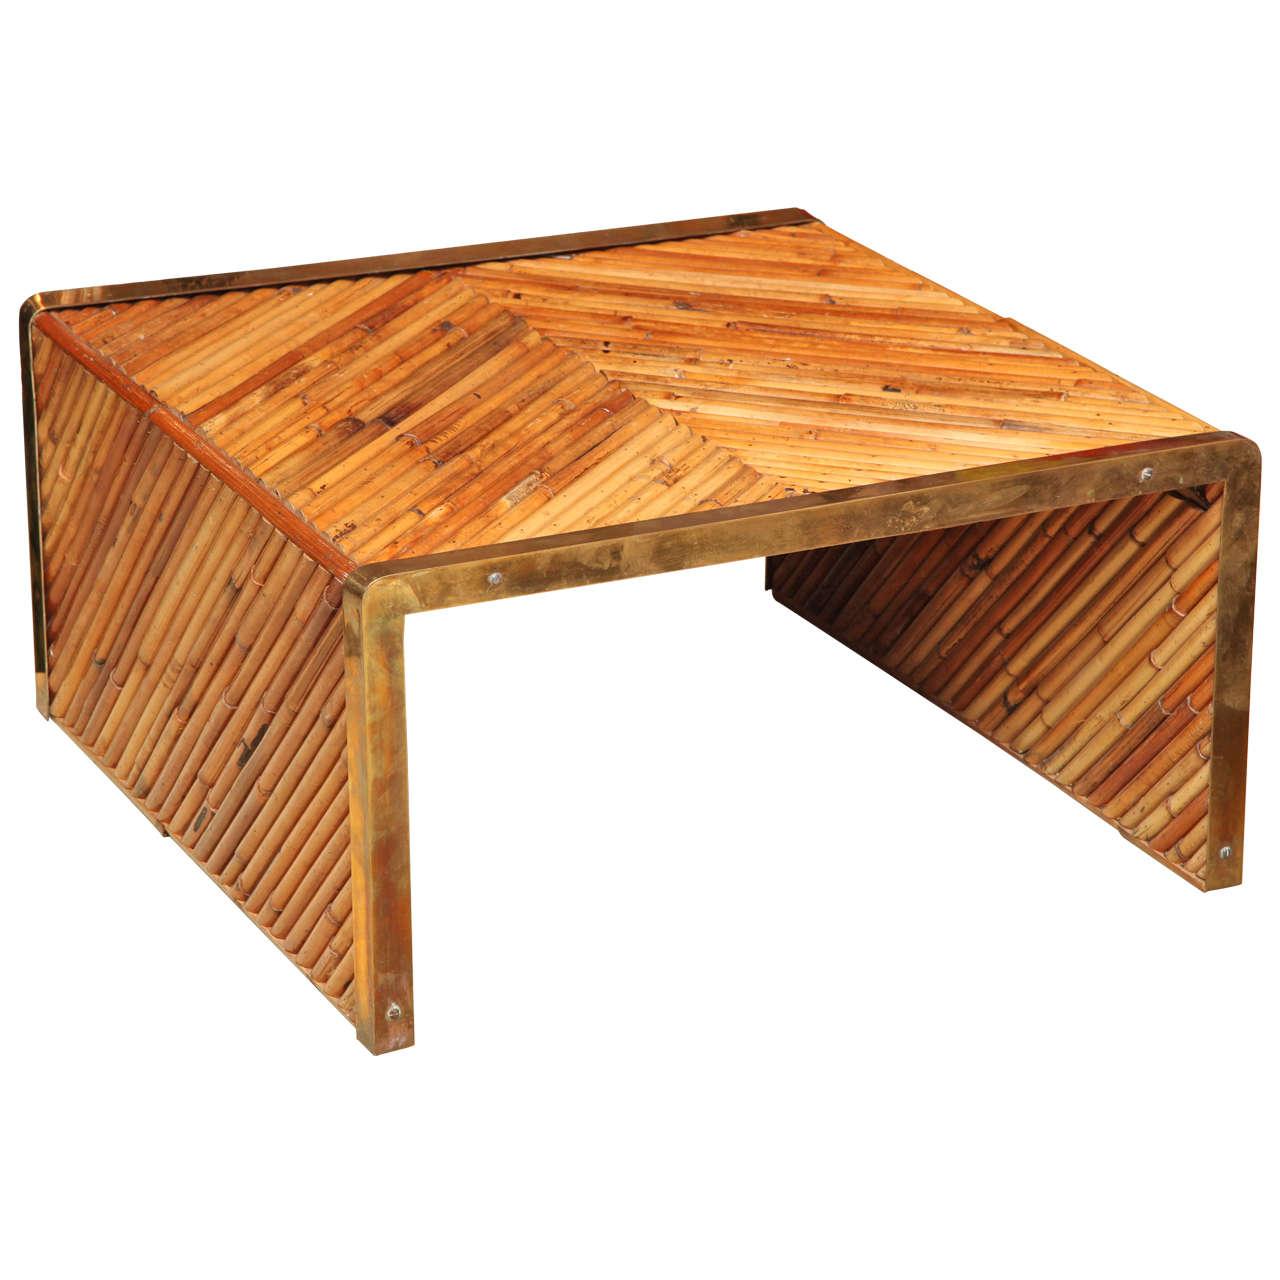 Gabriella Crespi Bamboo Coffee Table At 1stdibs